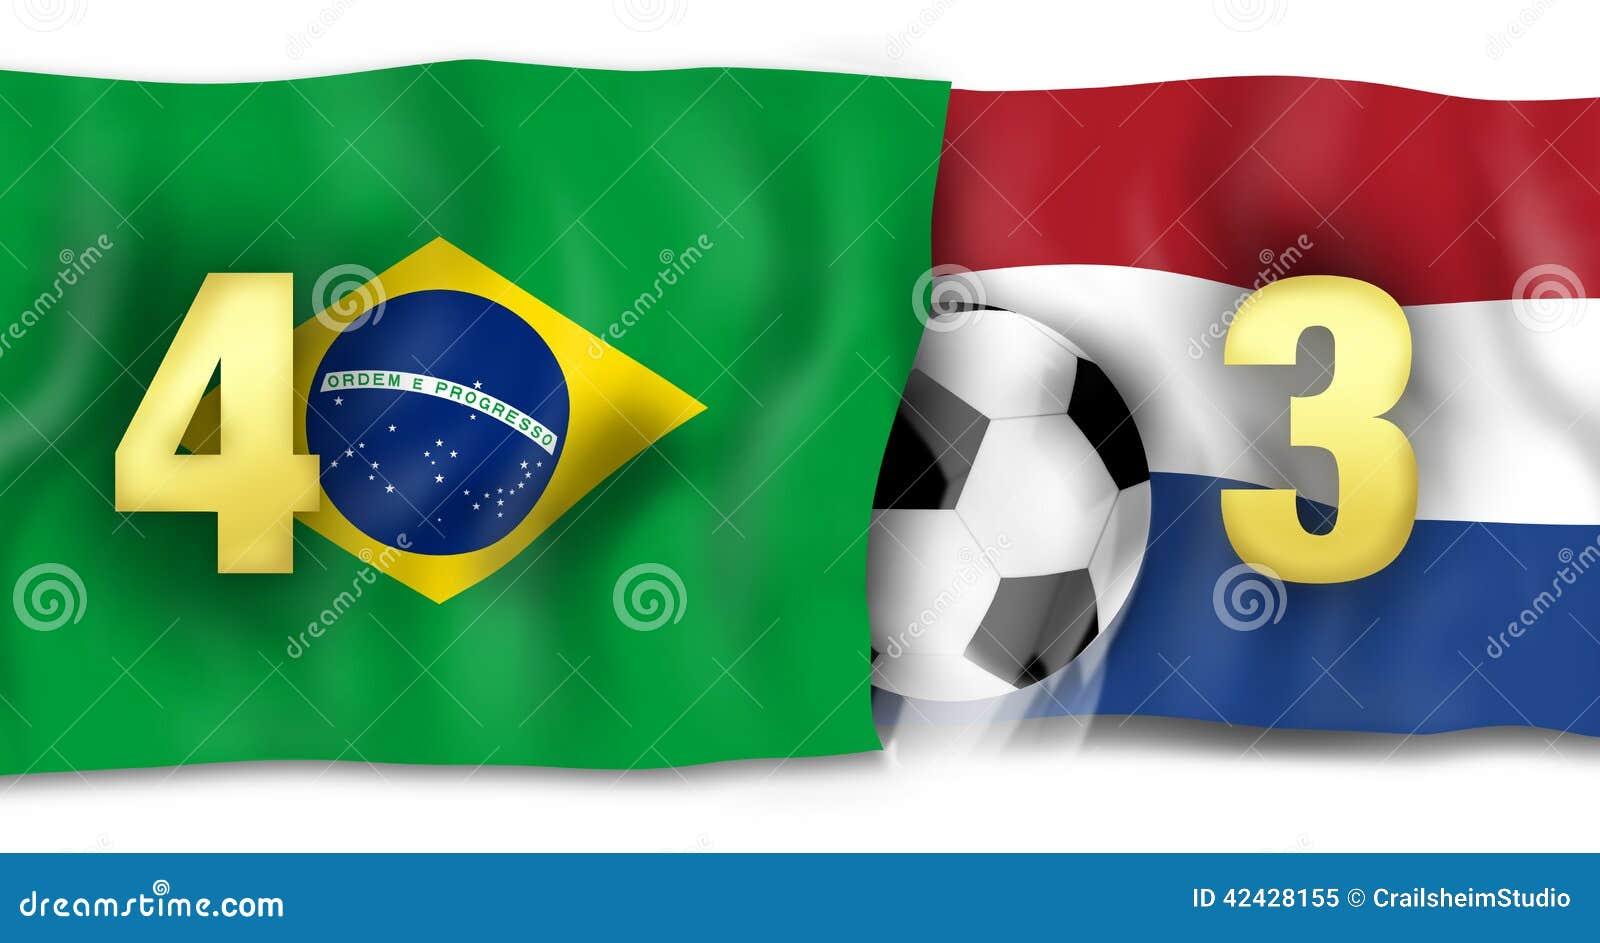 Brazilan 4to y Netherland 3ro